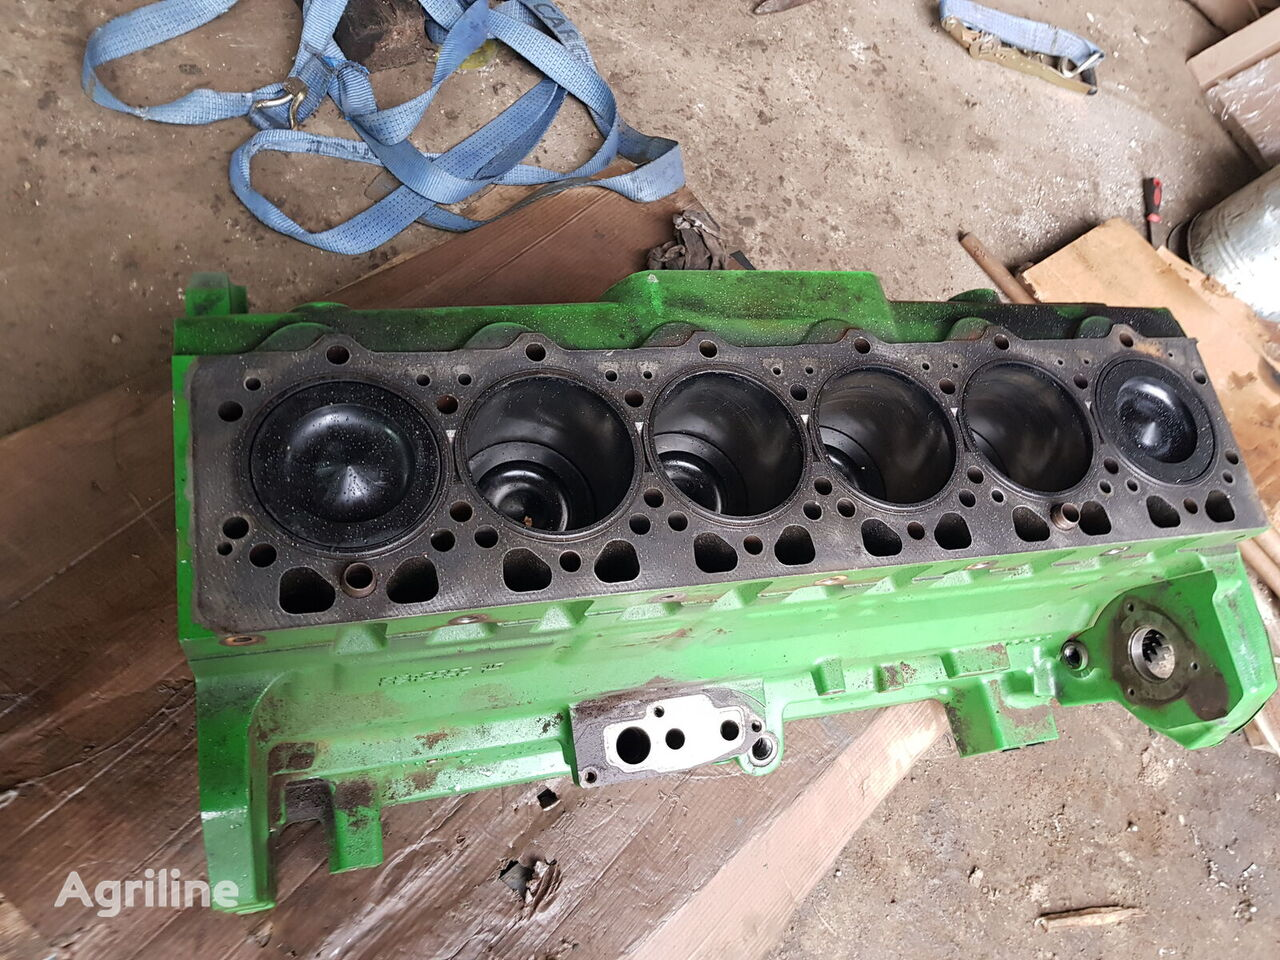 двигатель JOHN DEERE для зерноуборочного комбайна